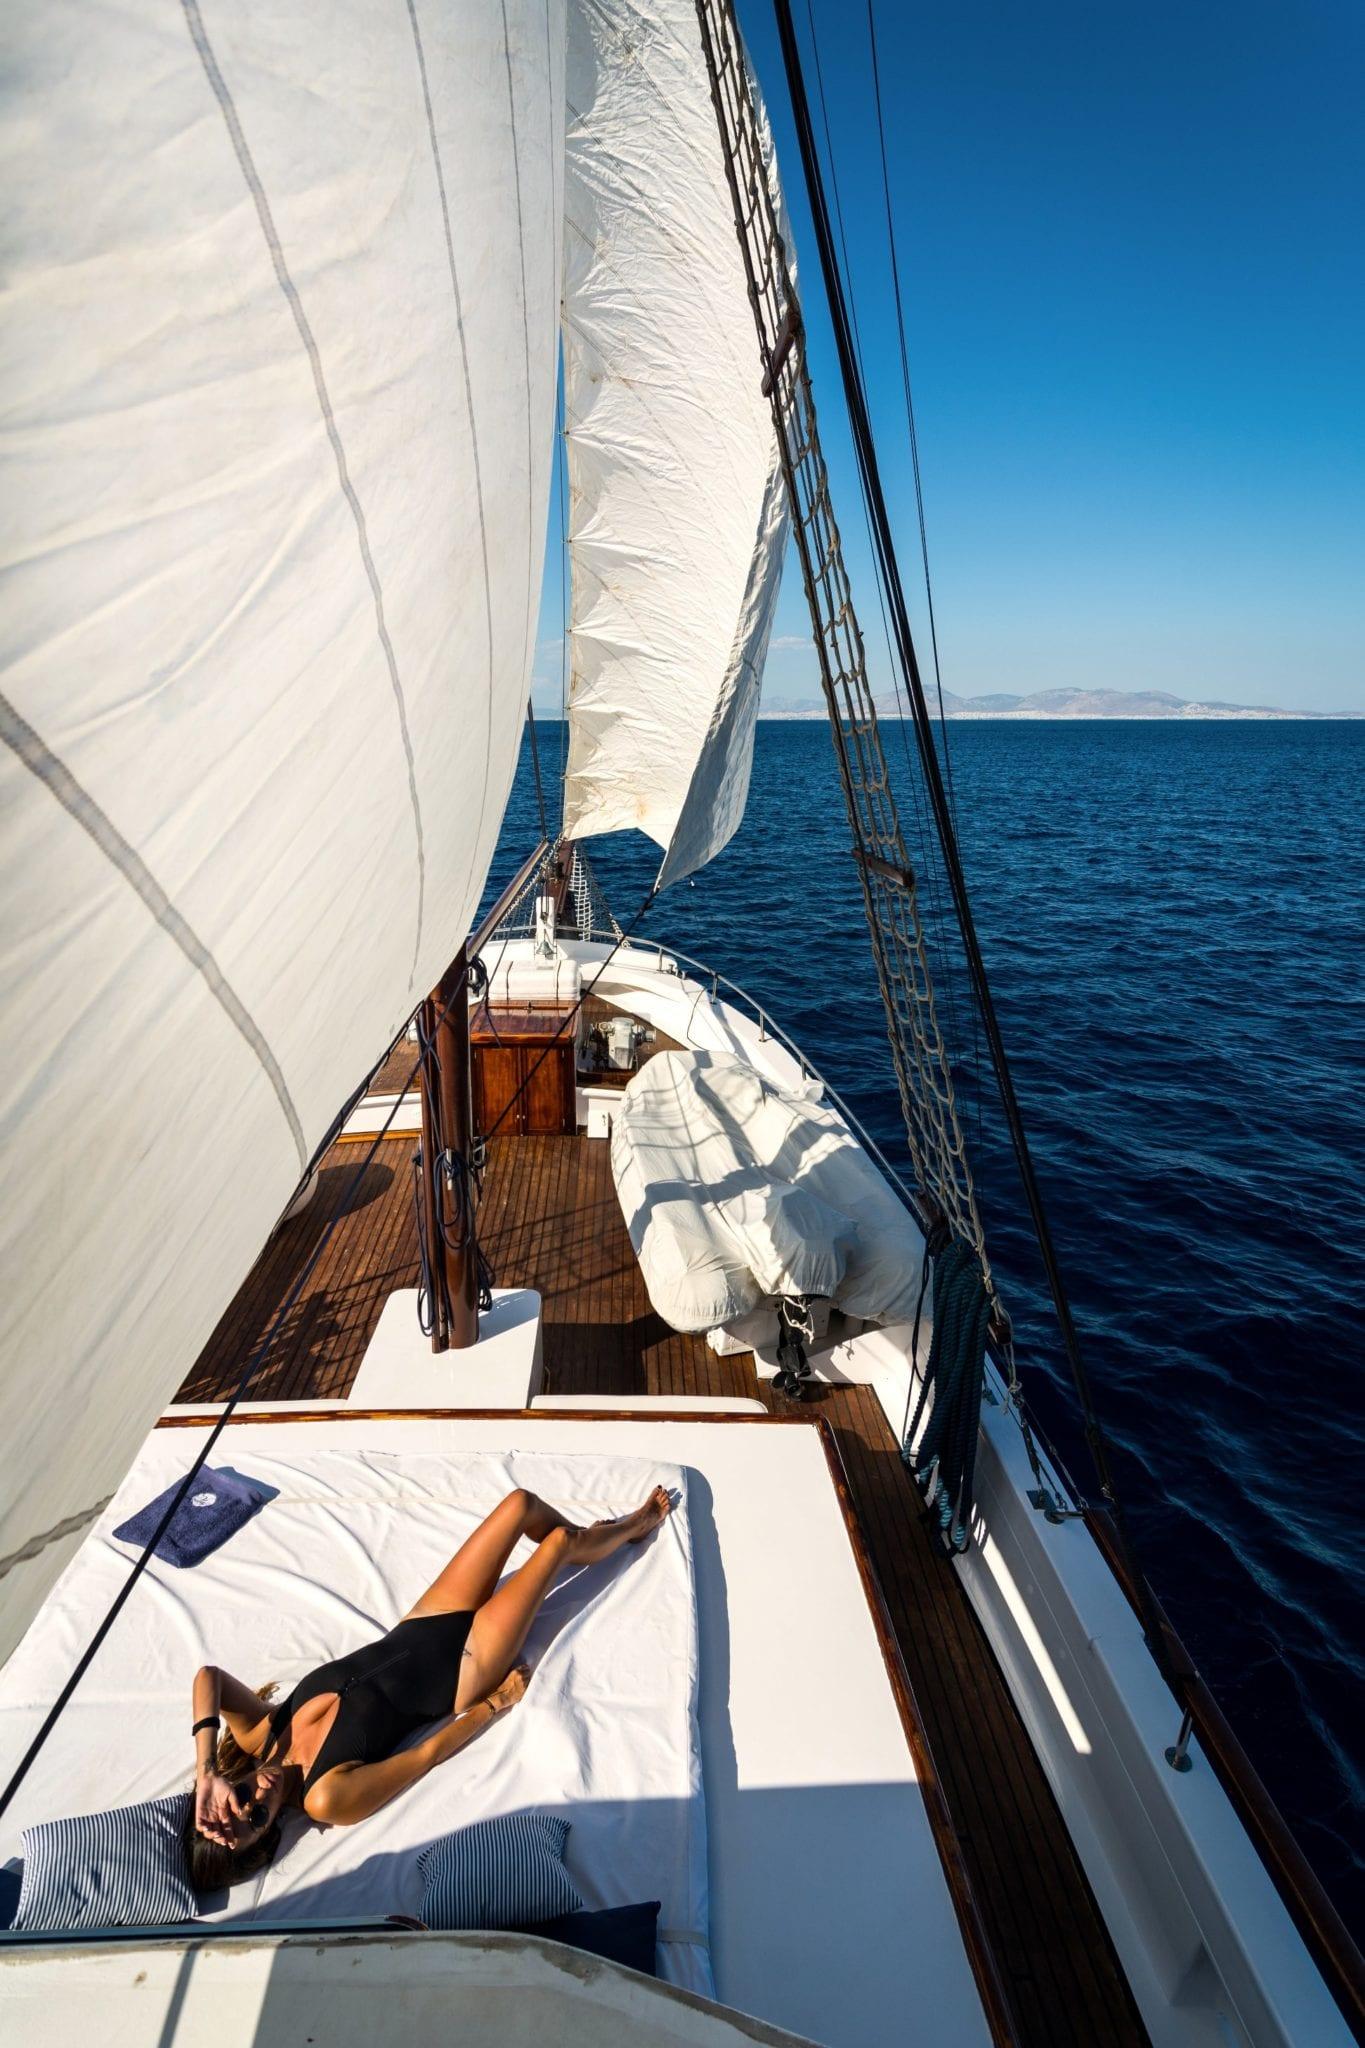 joanna k greek motor sailer sunning (2) min -  Valef Yachts Chartering - 4380